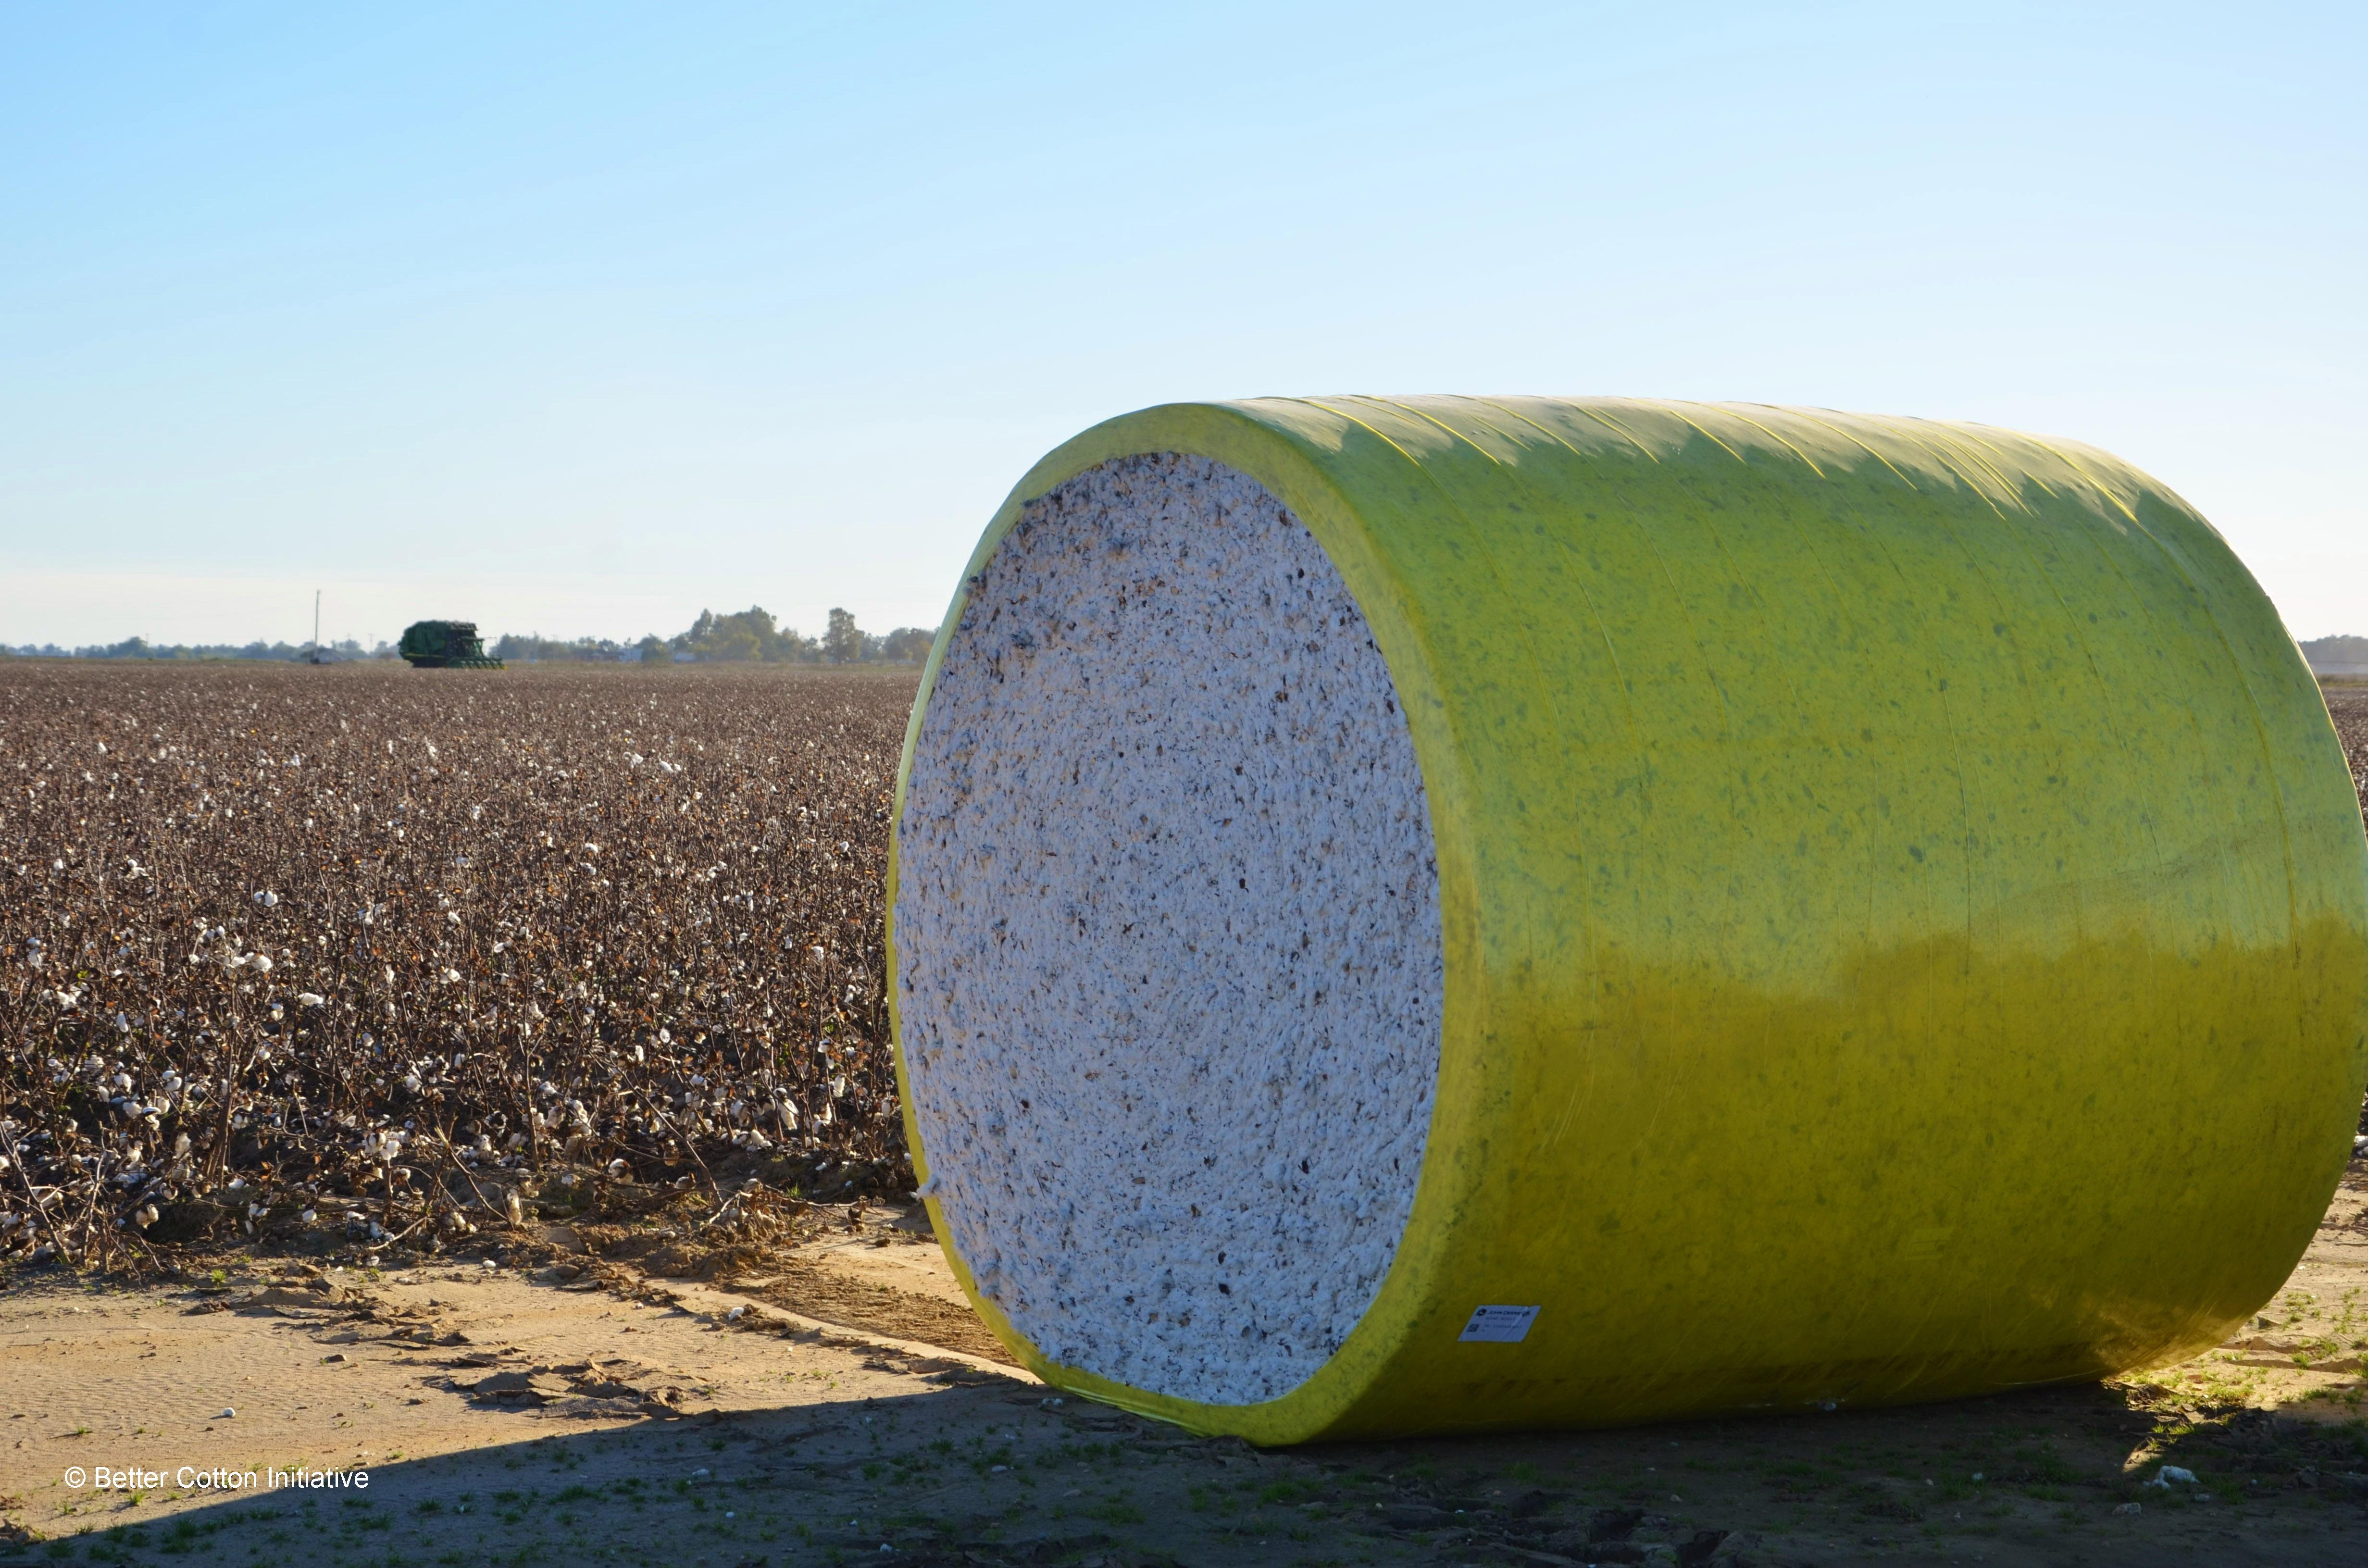 Cotton Bale USA